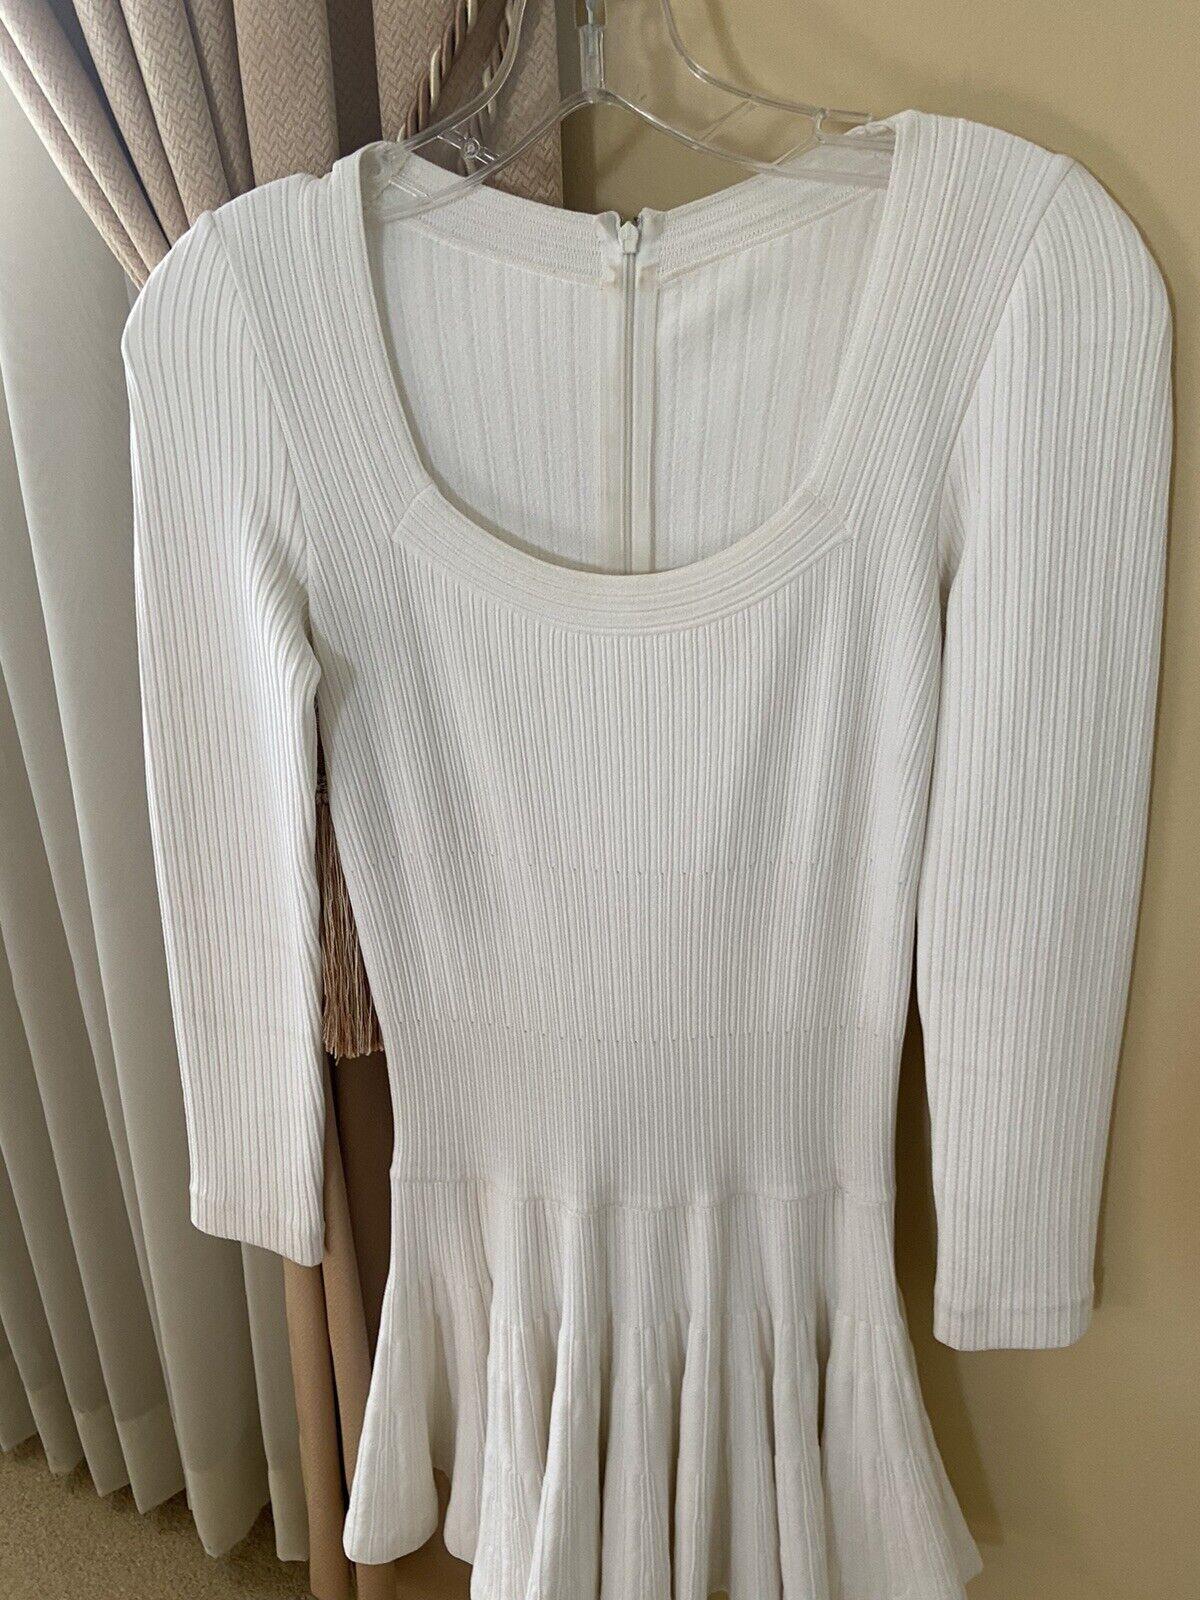 Azzedine Alaia White Long Sleeve Top Blouse Dress… - image 2